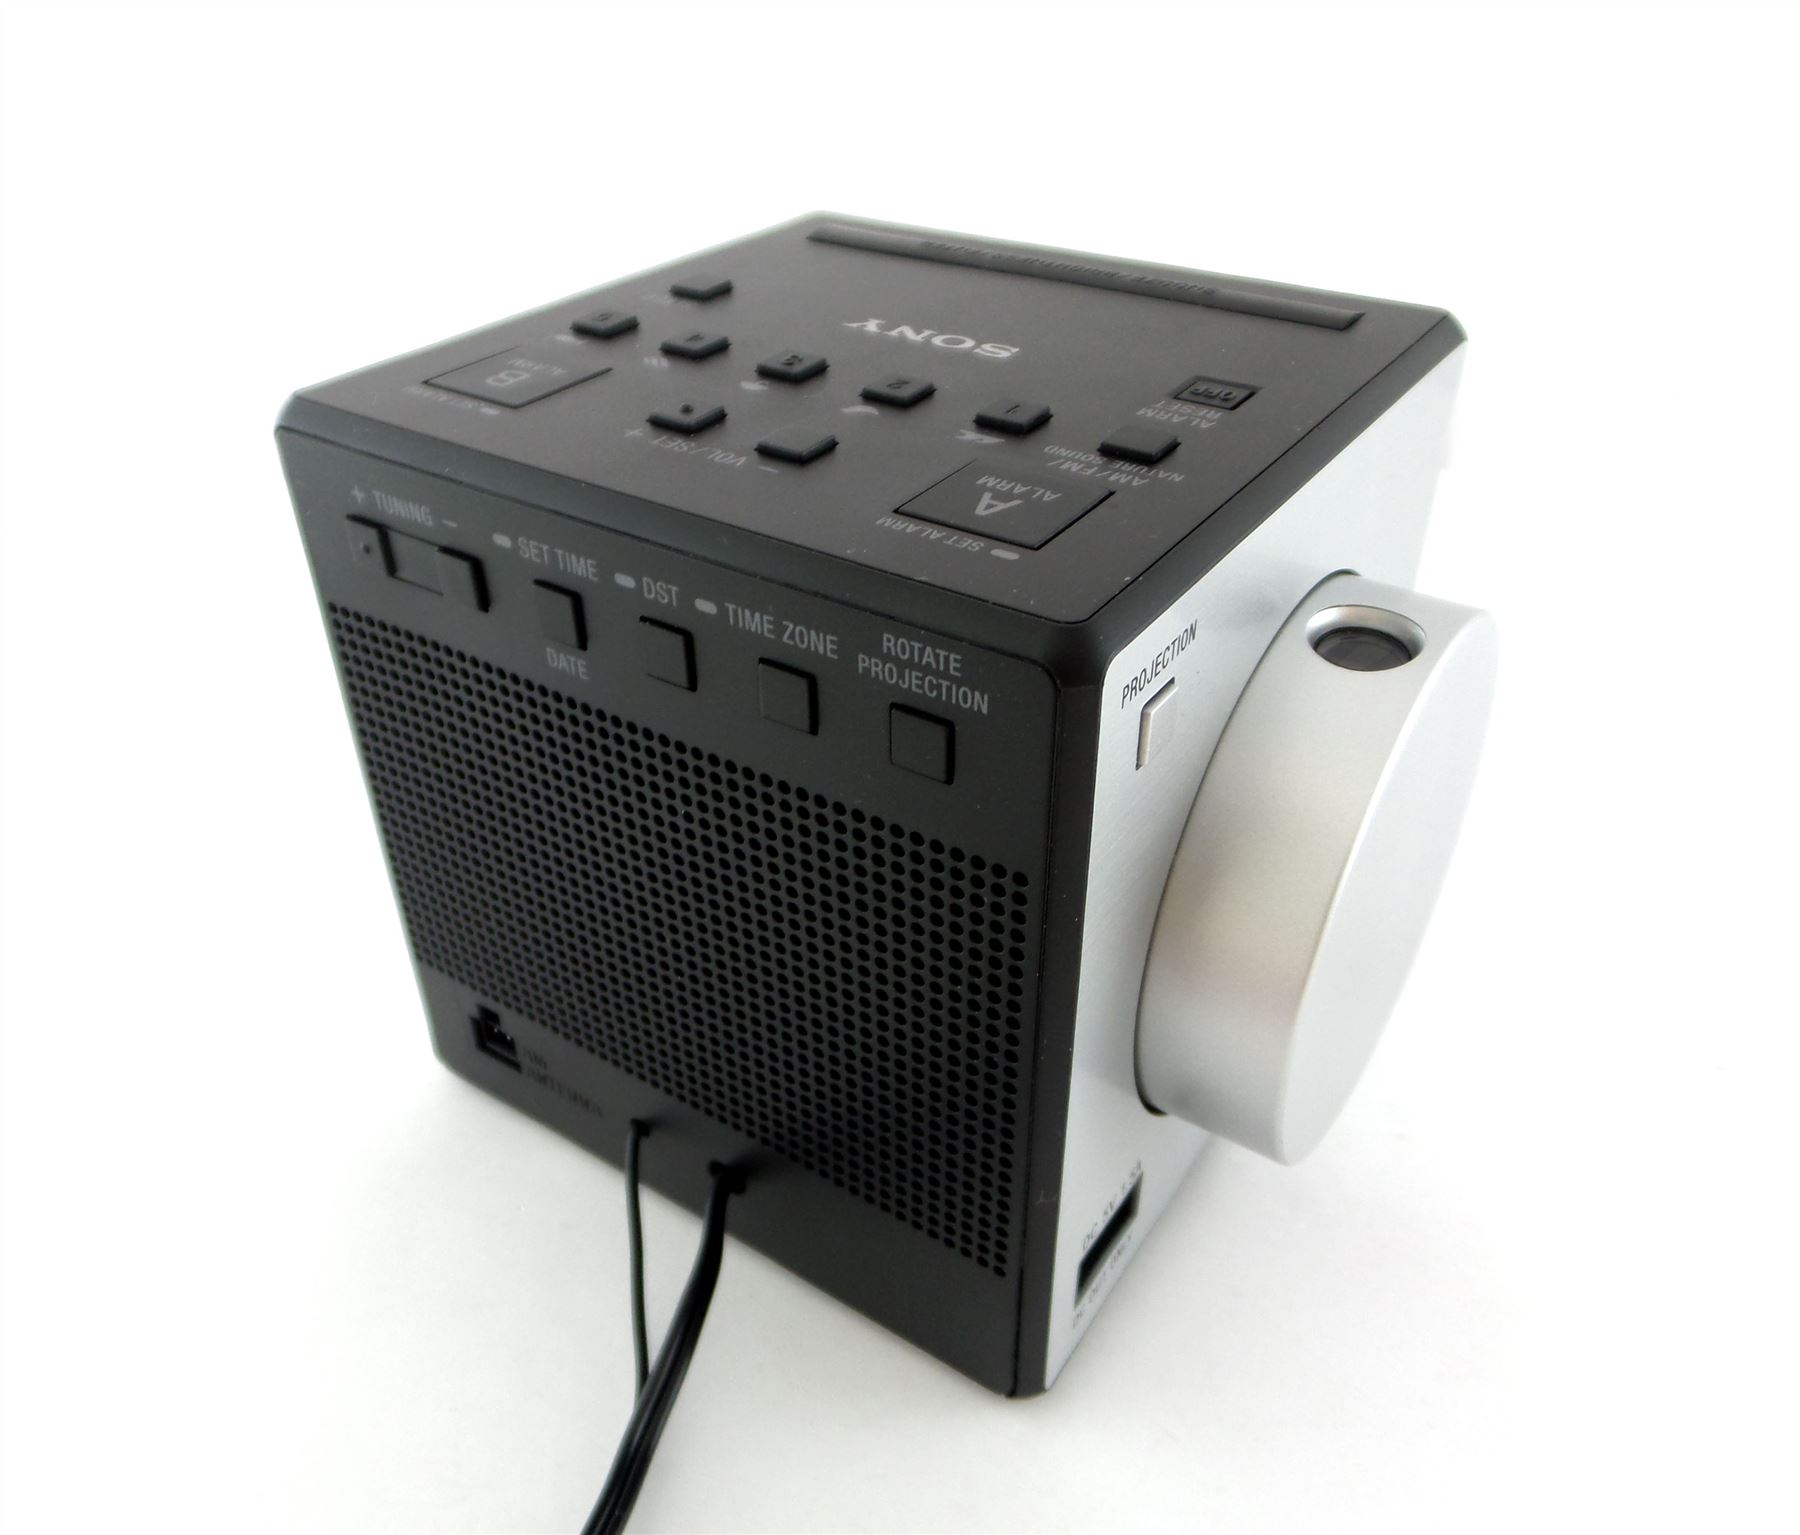 sony icf c1pj dual alarm clock radio w nature sounds dts am fm projector ebay. Black Bedroom Furniture Sets. Home Design Ideas